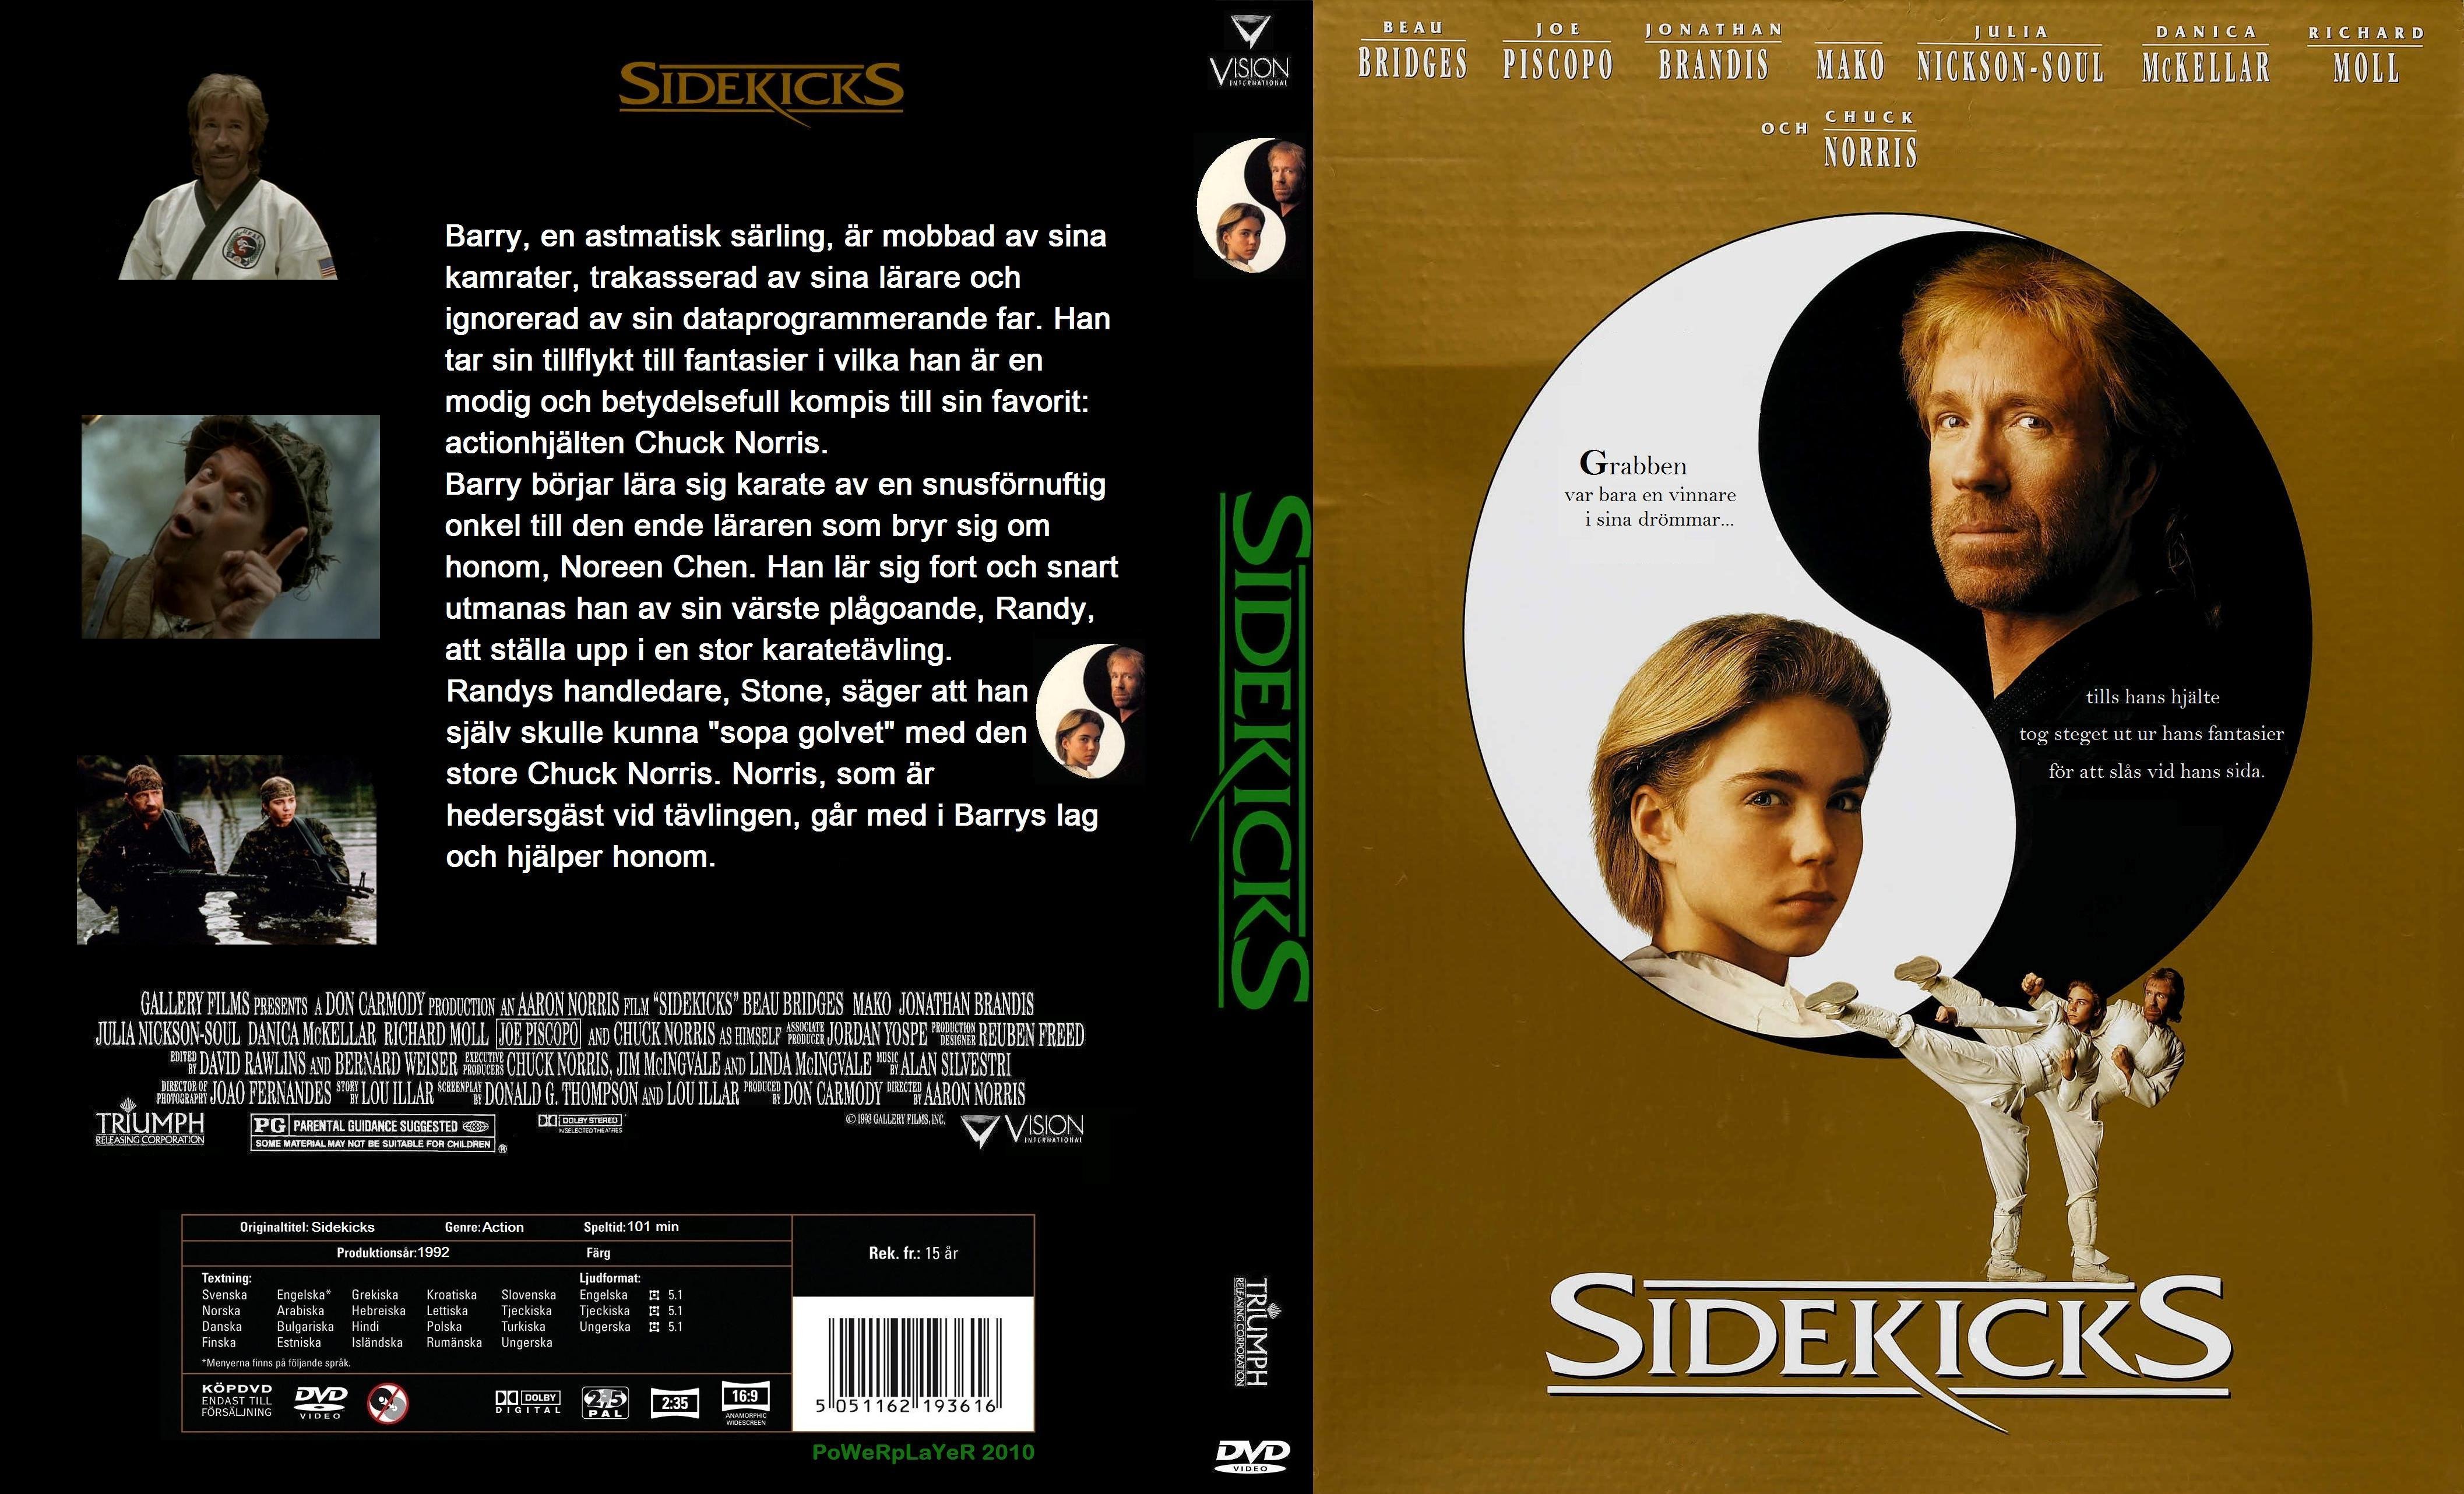 Sidekicks 1992